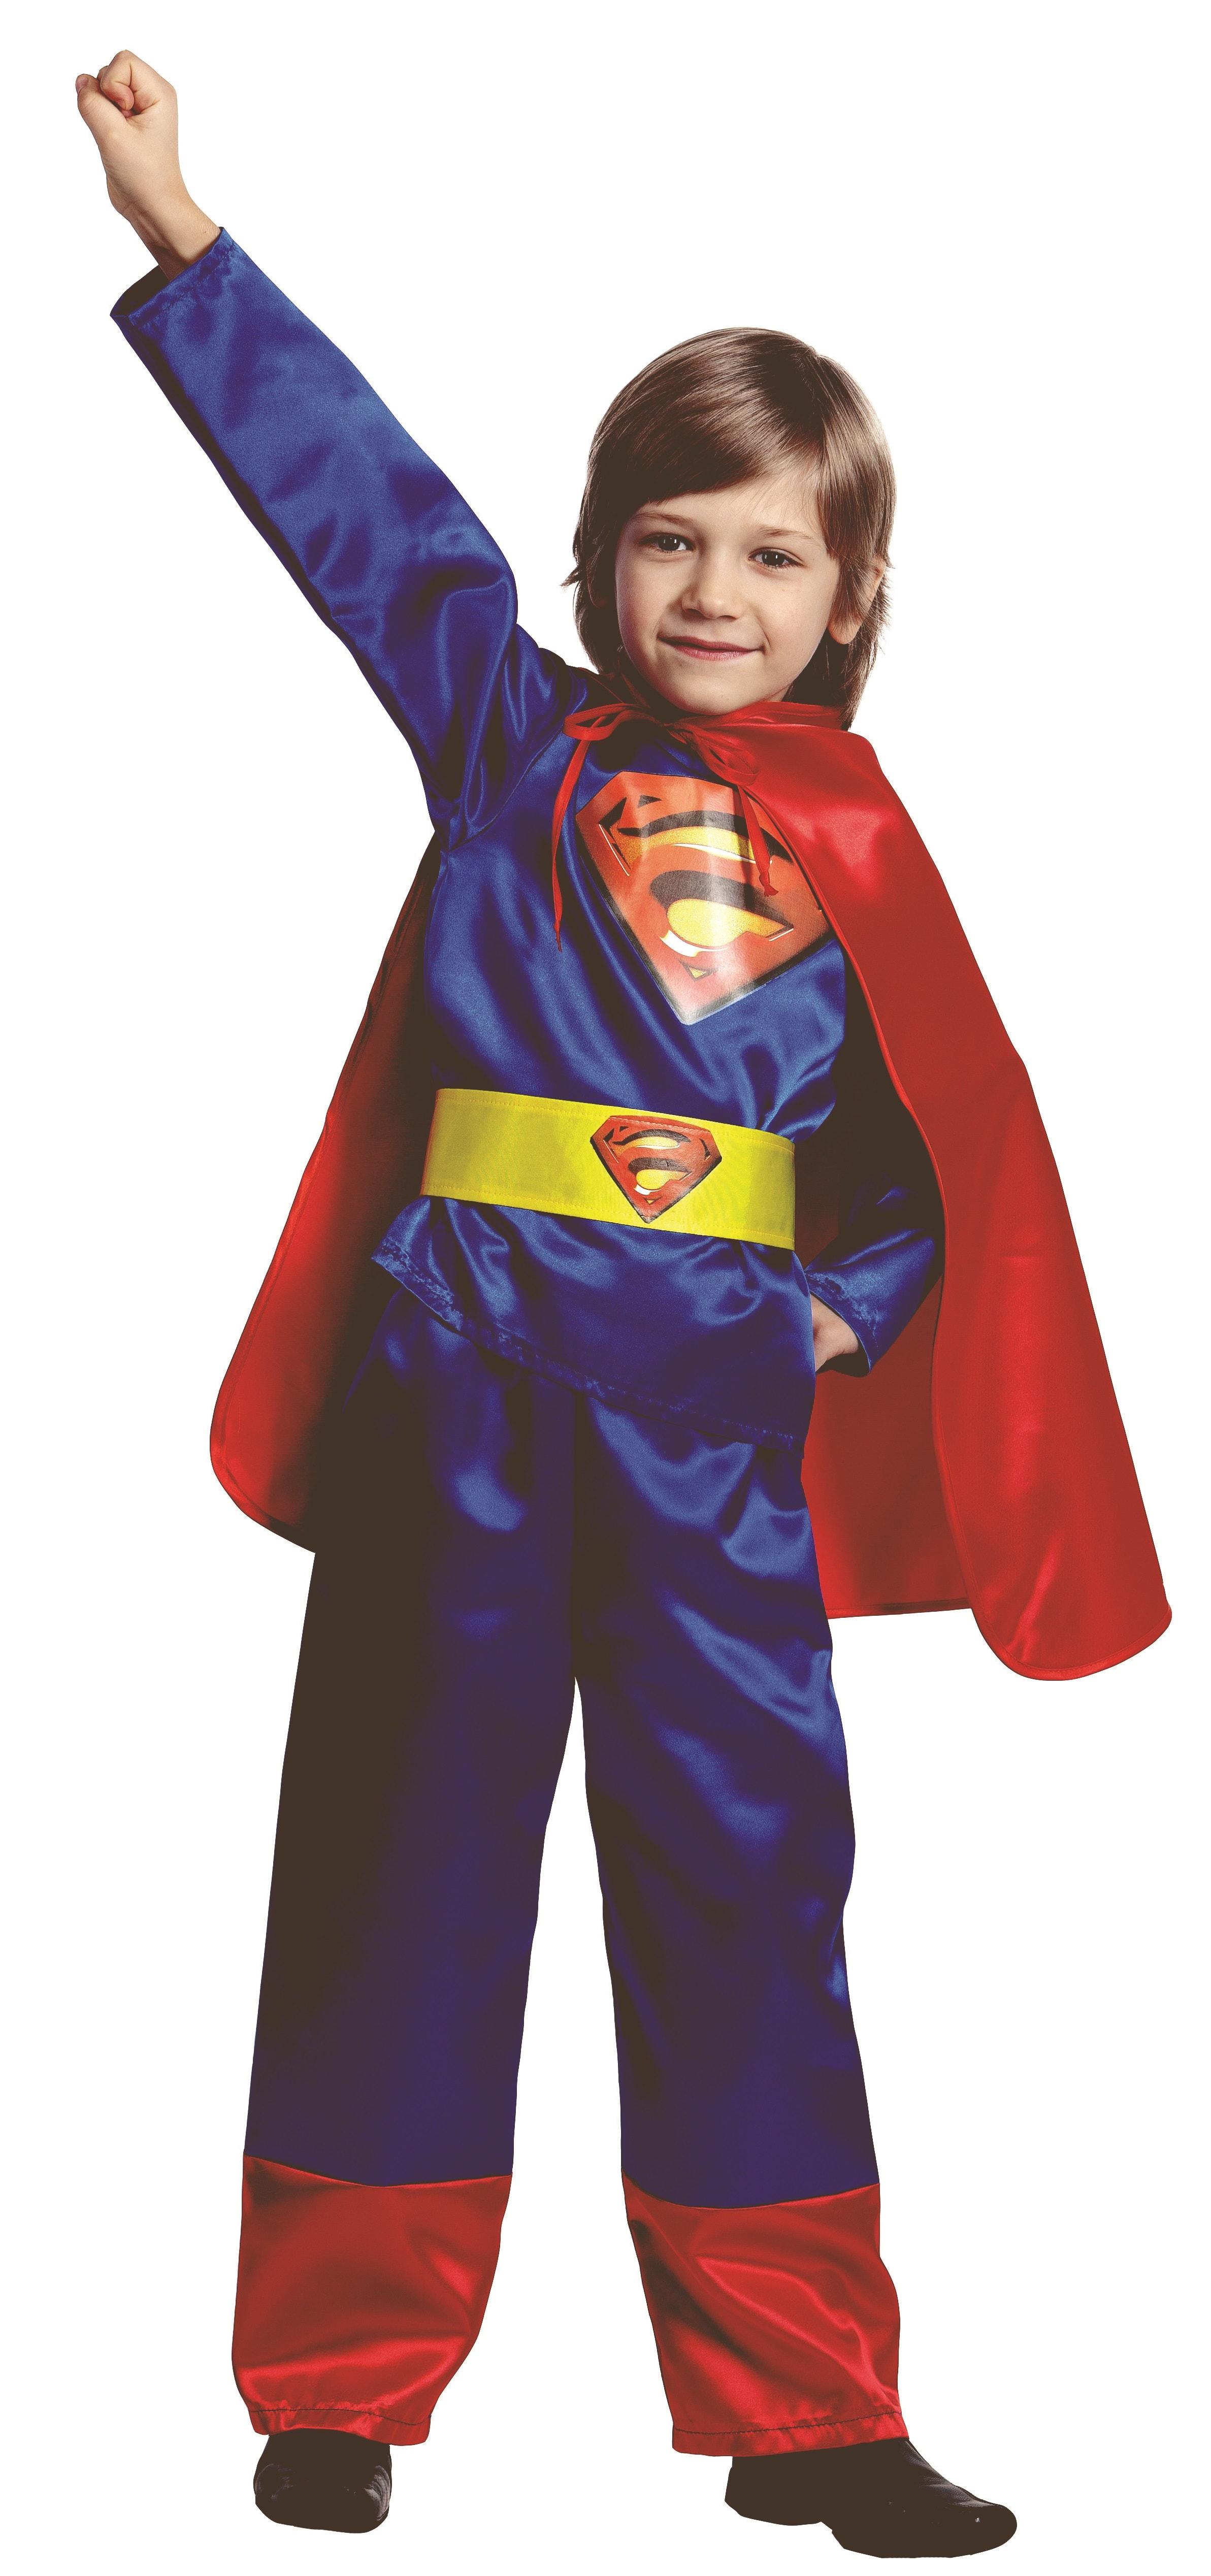 Купить 8028, Костюм Батик Супермен (Атлас) Детский 40 (158 см),